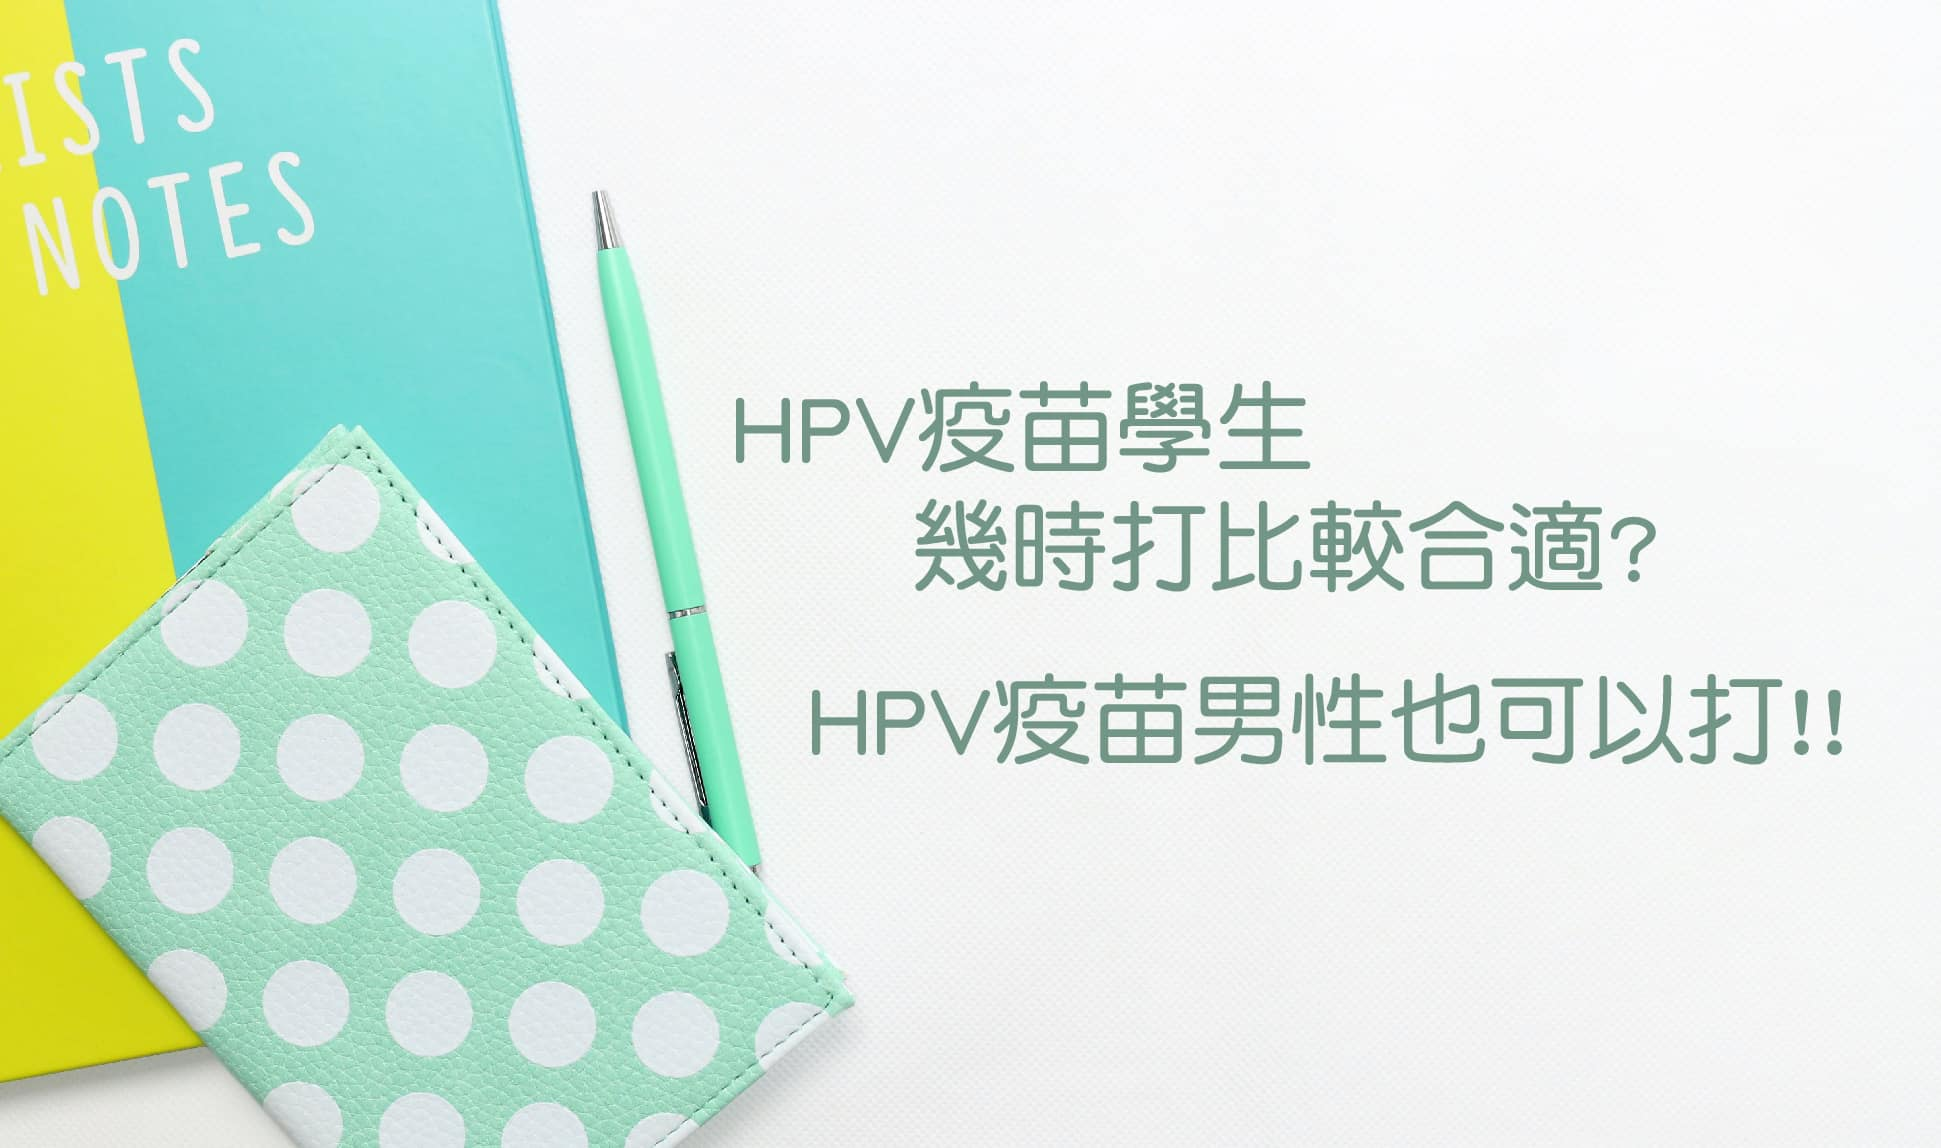 HPV疫苗學生幾時打比較合適?原來HPV疫苗男性也可以打!!